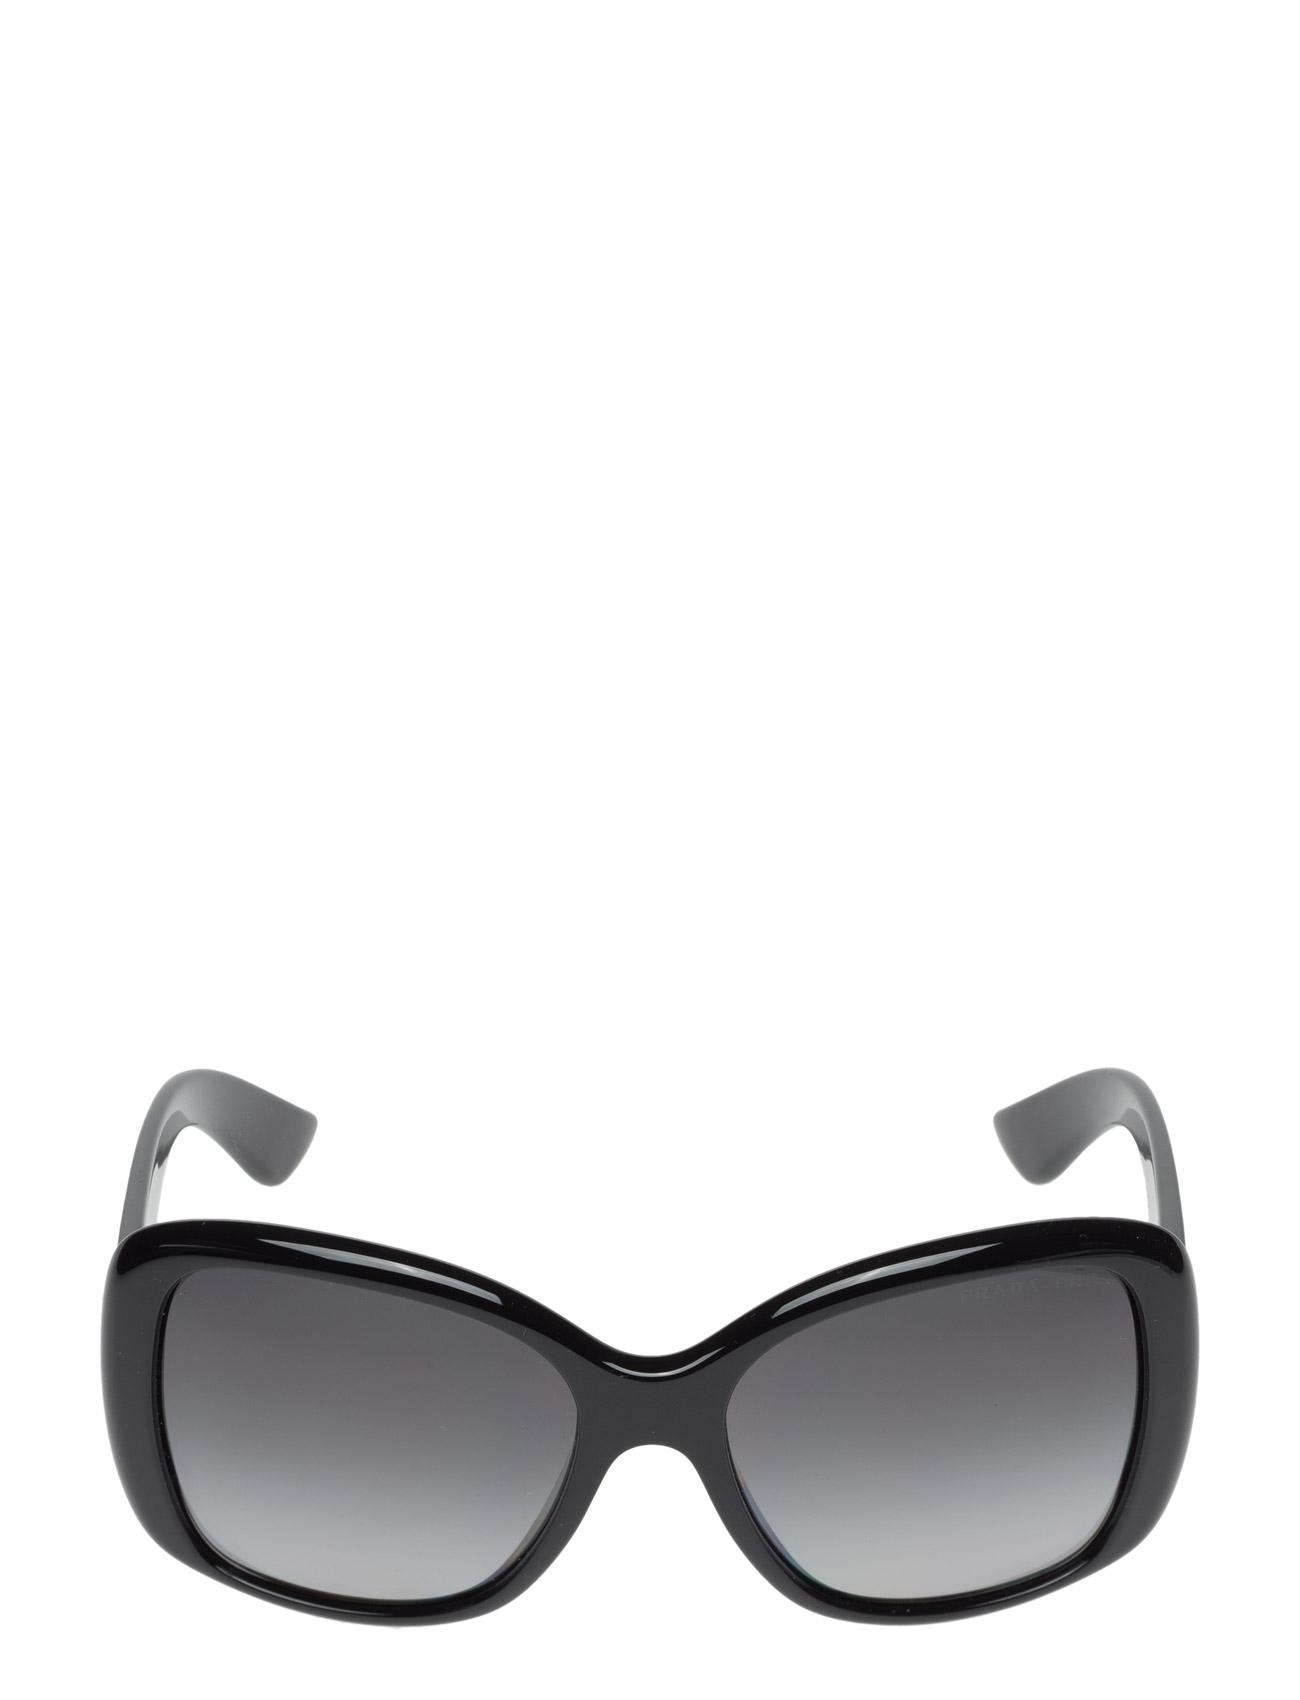 Heritage | Triangle Prada Sunglasses Solbriller til Damer i